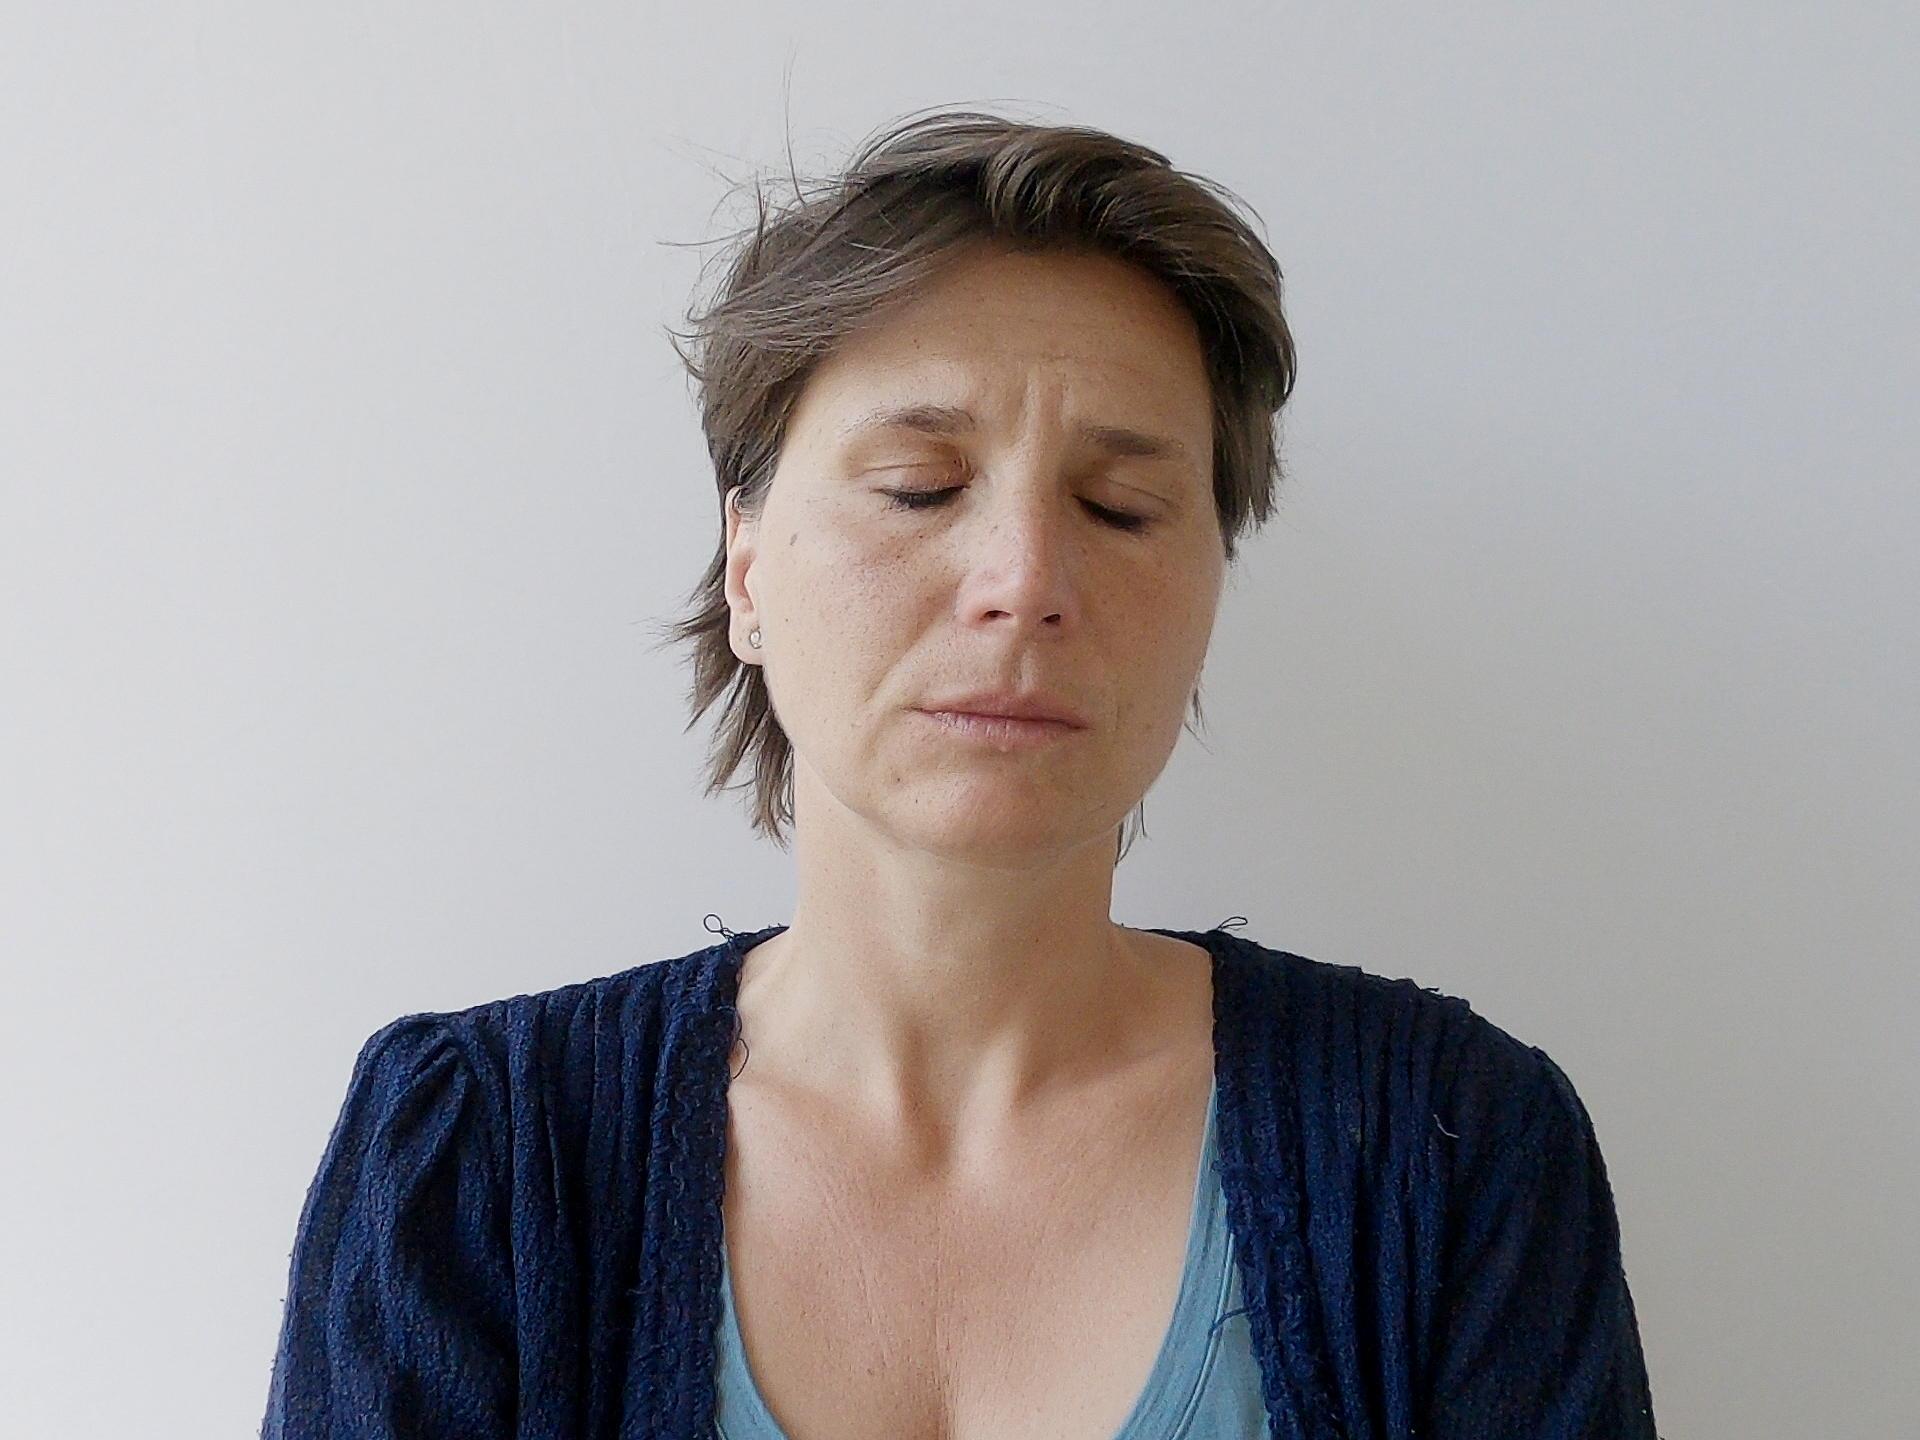 Franziska Roloff